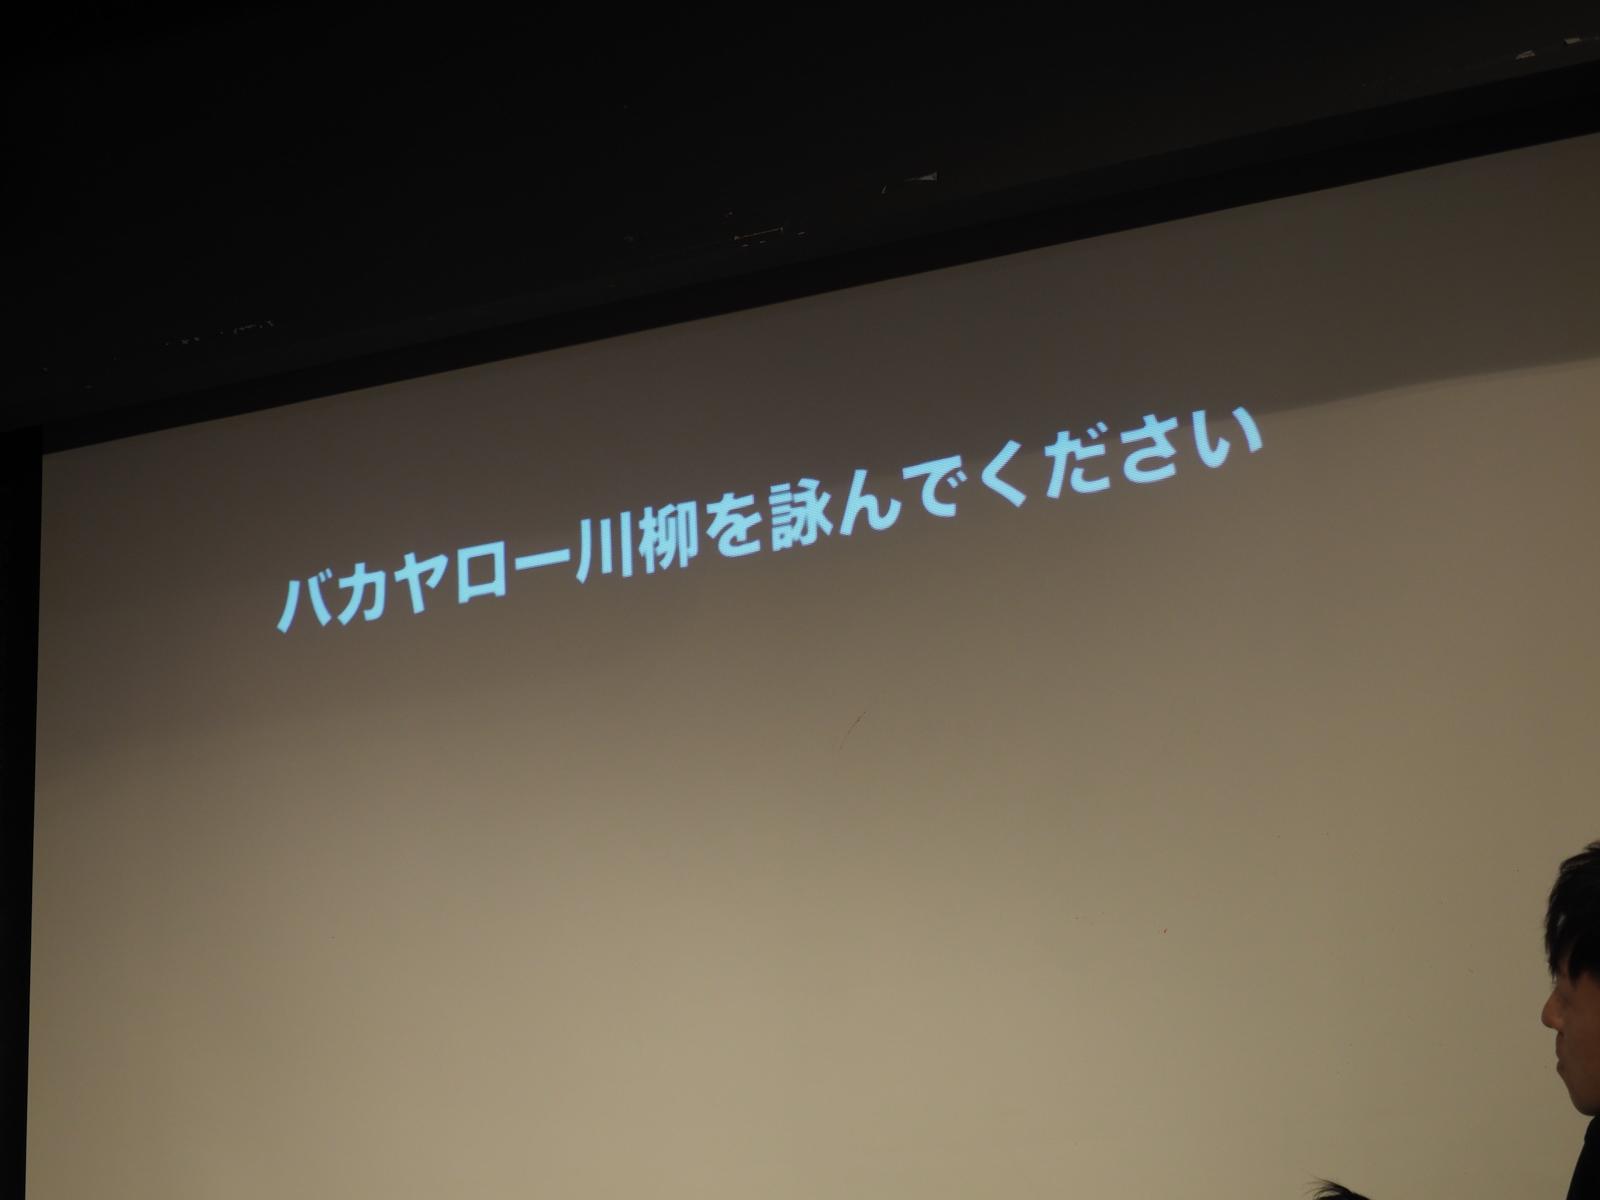 f:id:motomachi24:20170115163426j:plain